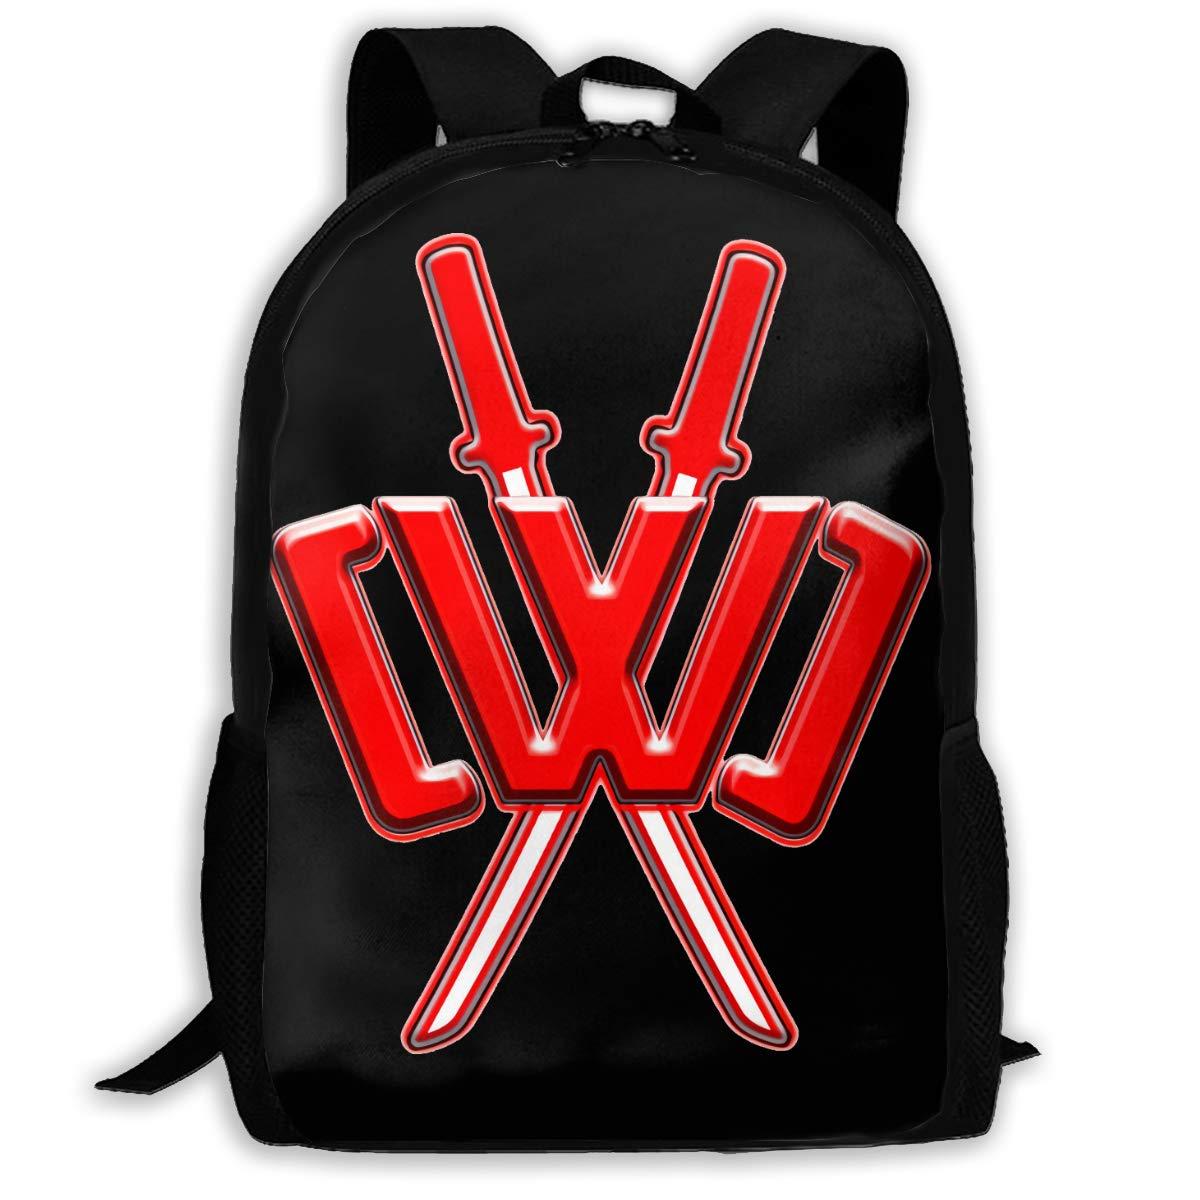 Amazon.com: Laoshi CWC Chad Wild Clay Ninja Kid Backpack ...